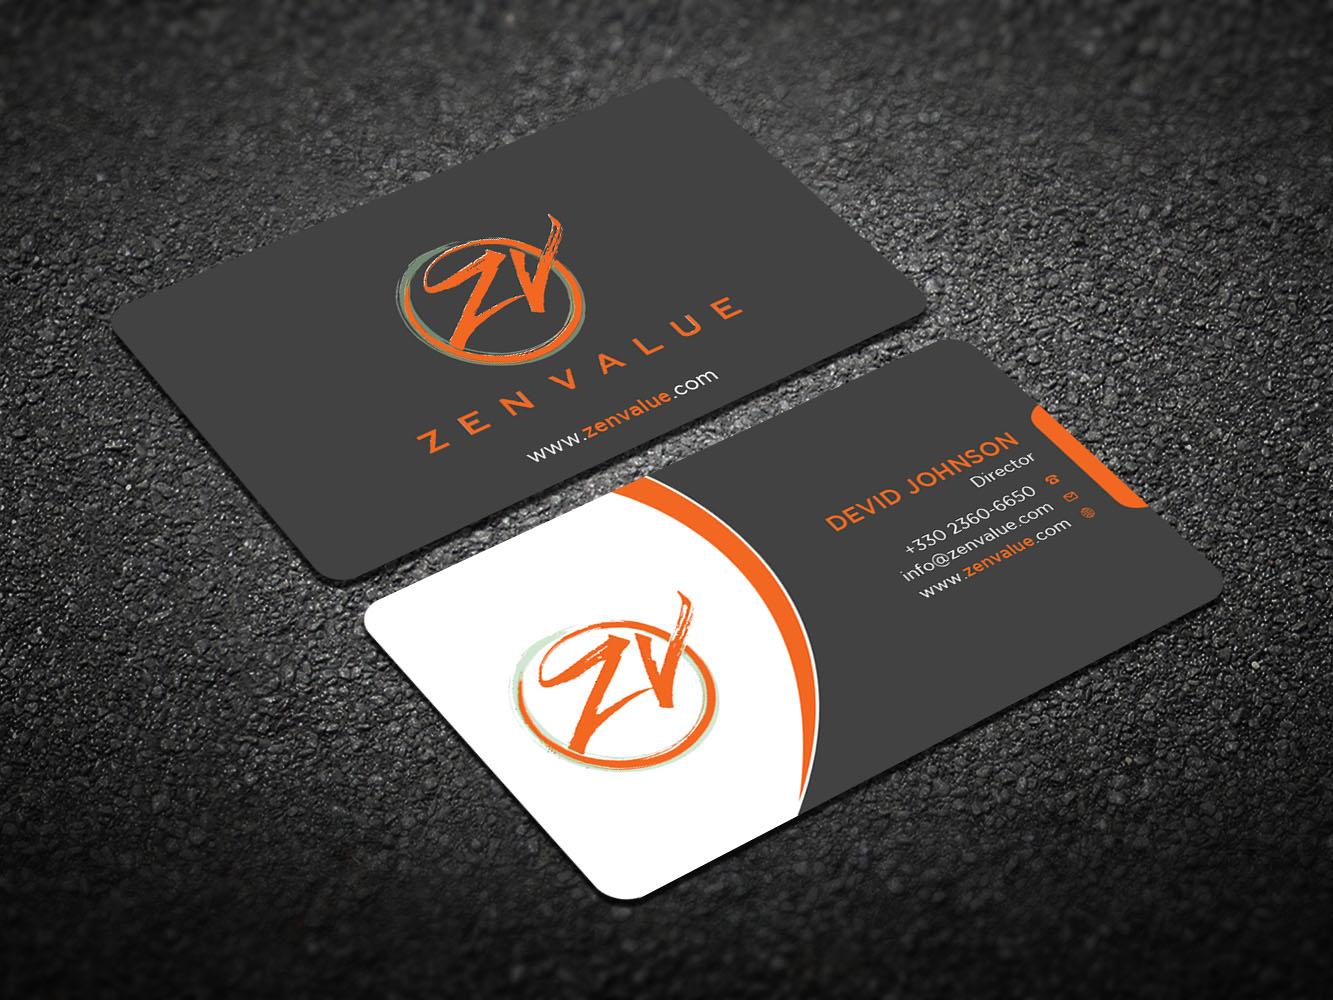 Upmarket bold management consulting business card design for zen business card design by design xeneration for zen value design 12588937 colourmoves